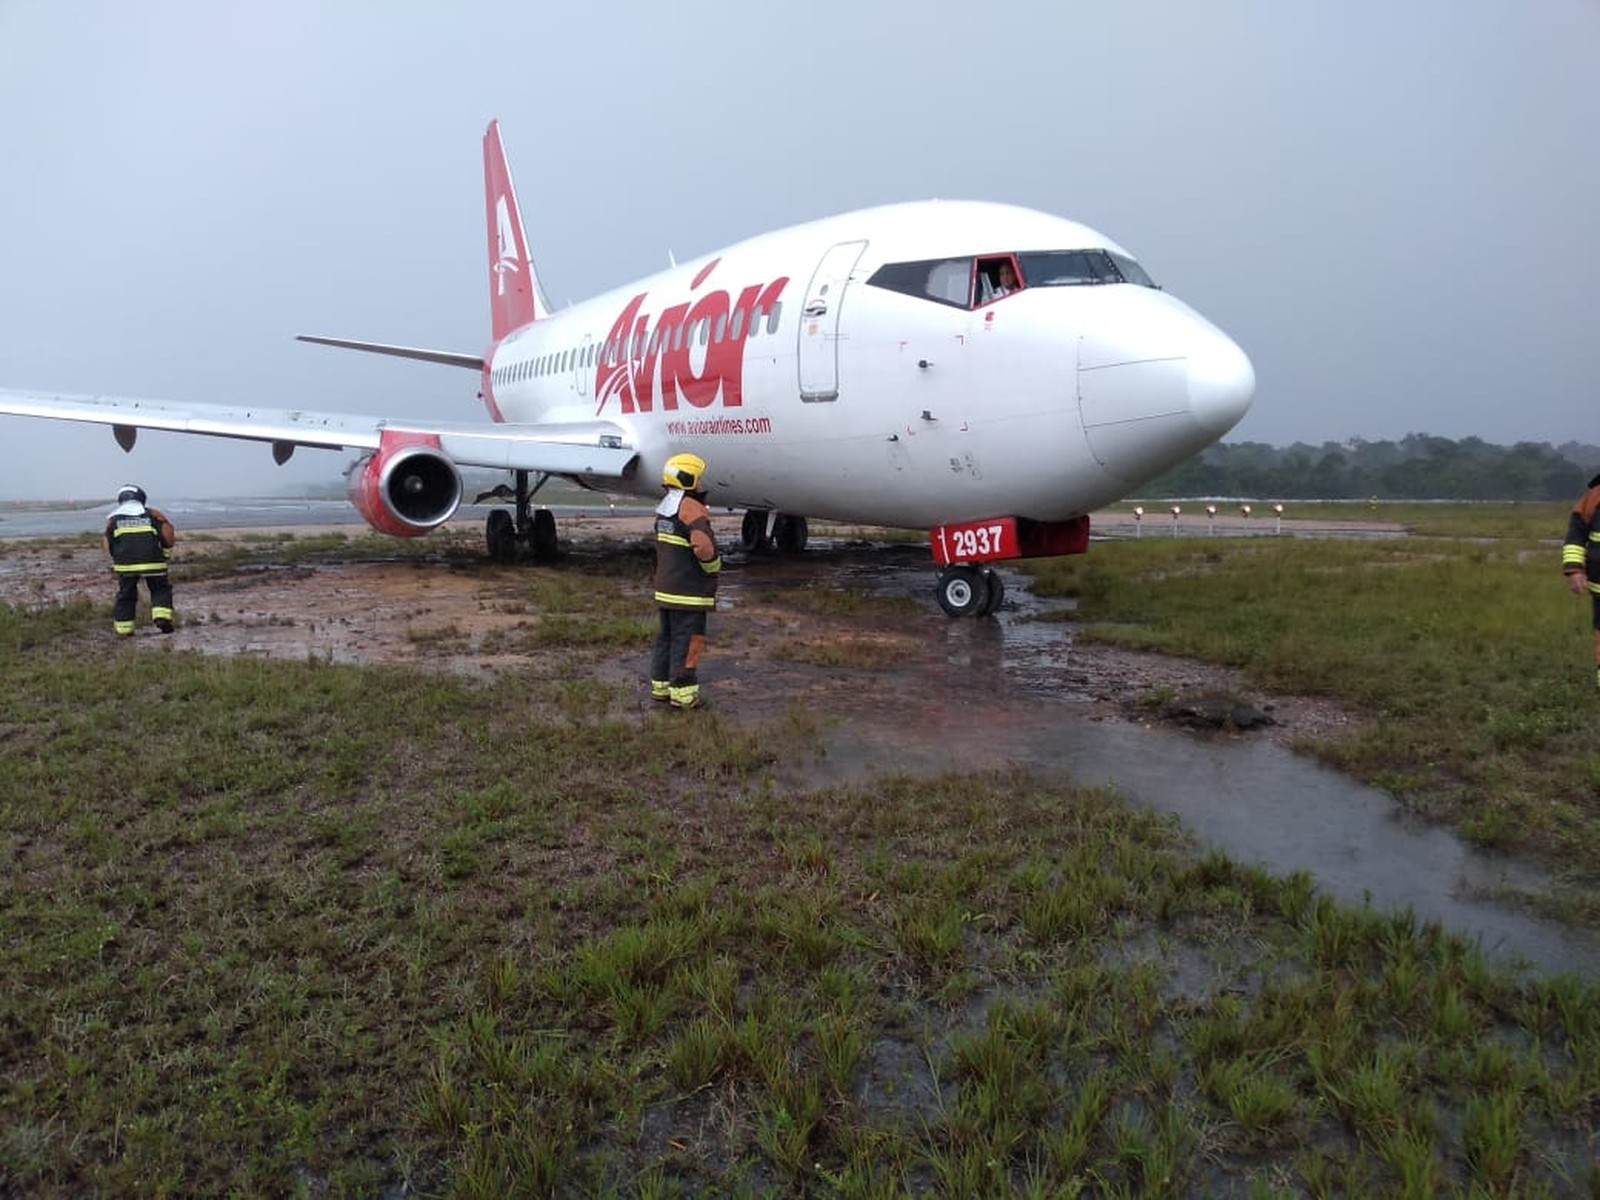 Avião derrapa na pista e interdita aeroporto de Manaus durante forte chuva